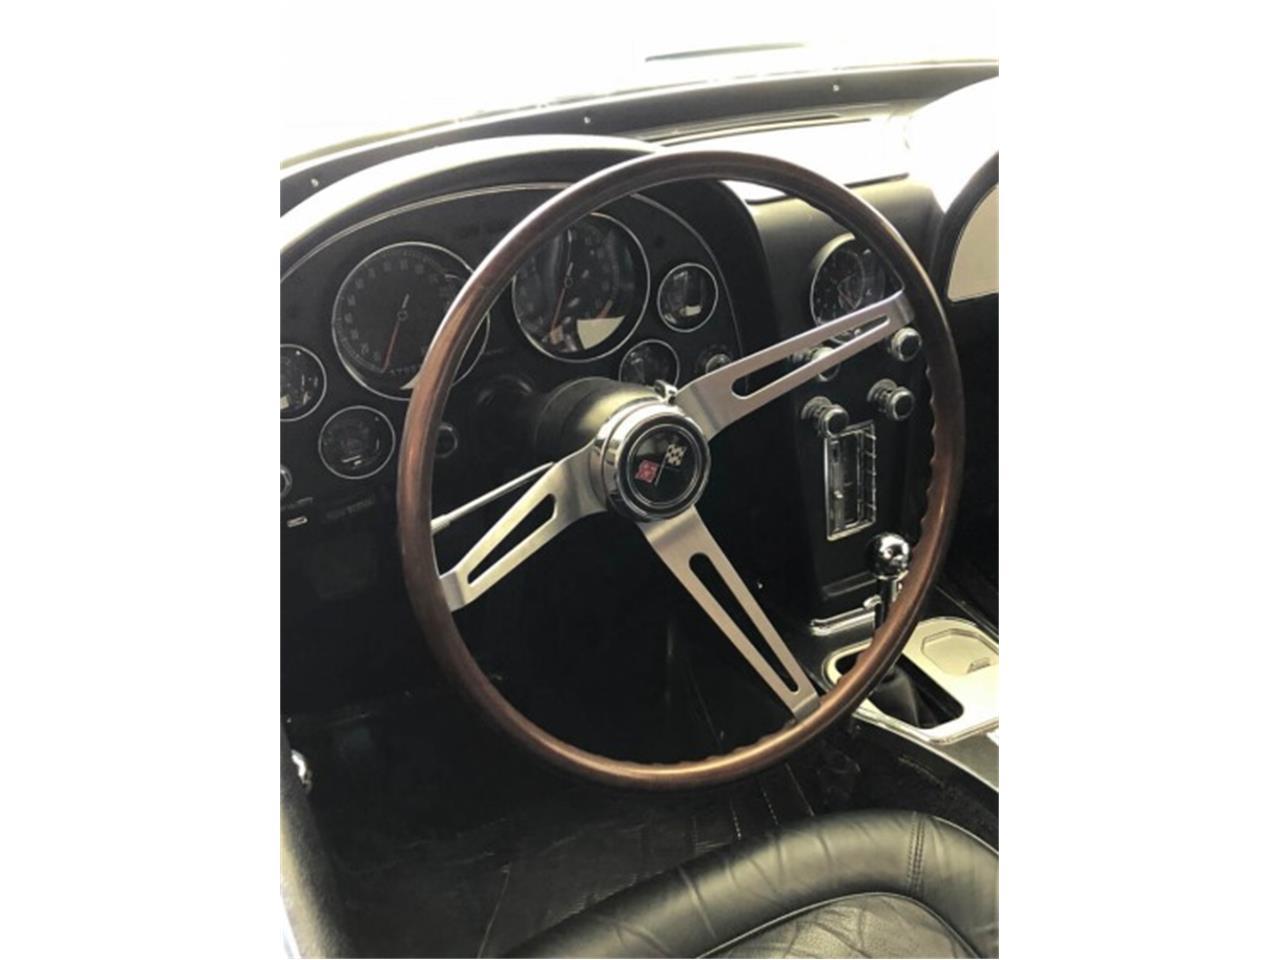 1967 Chevrolet Corvette (CC-1238483) for sale in Sparks, Nevada